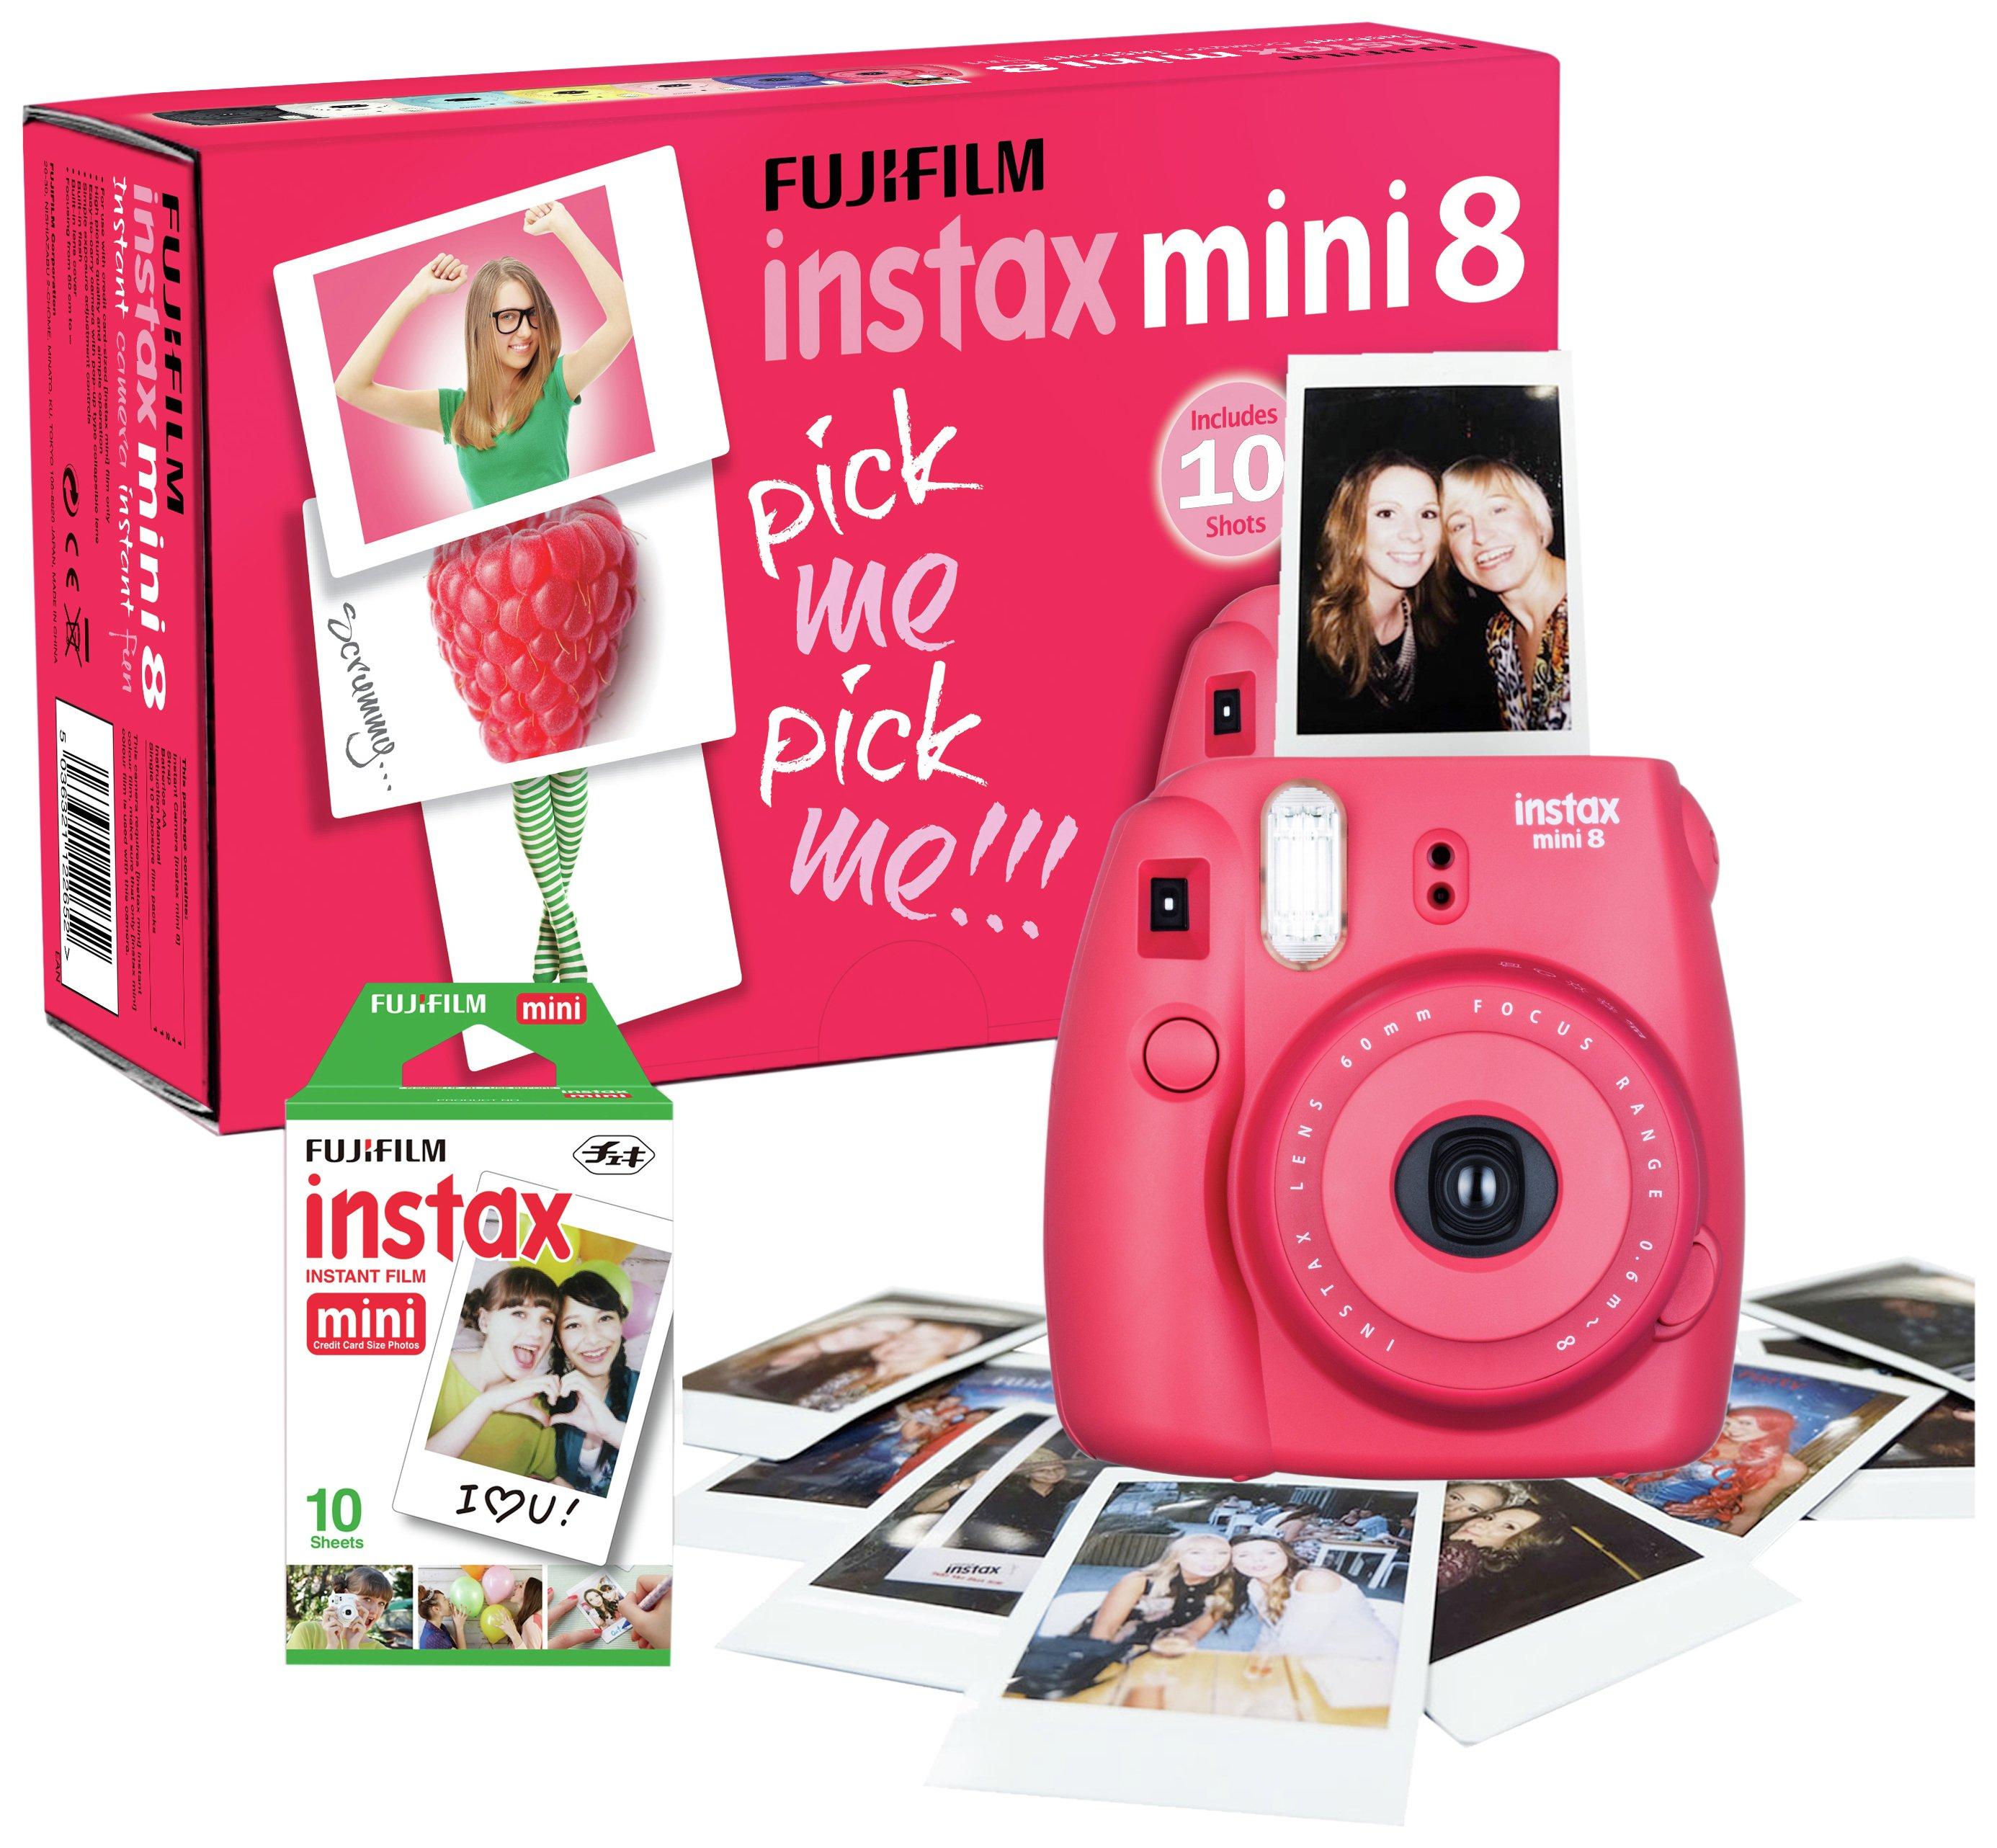 Fujifilm Instax Mini 8 Camera with 10 Shots - Raspberry.